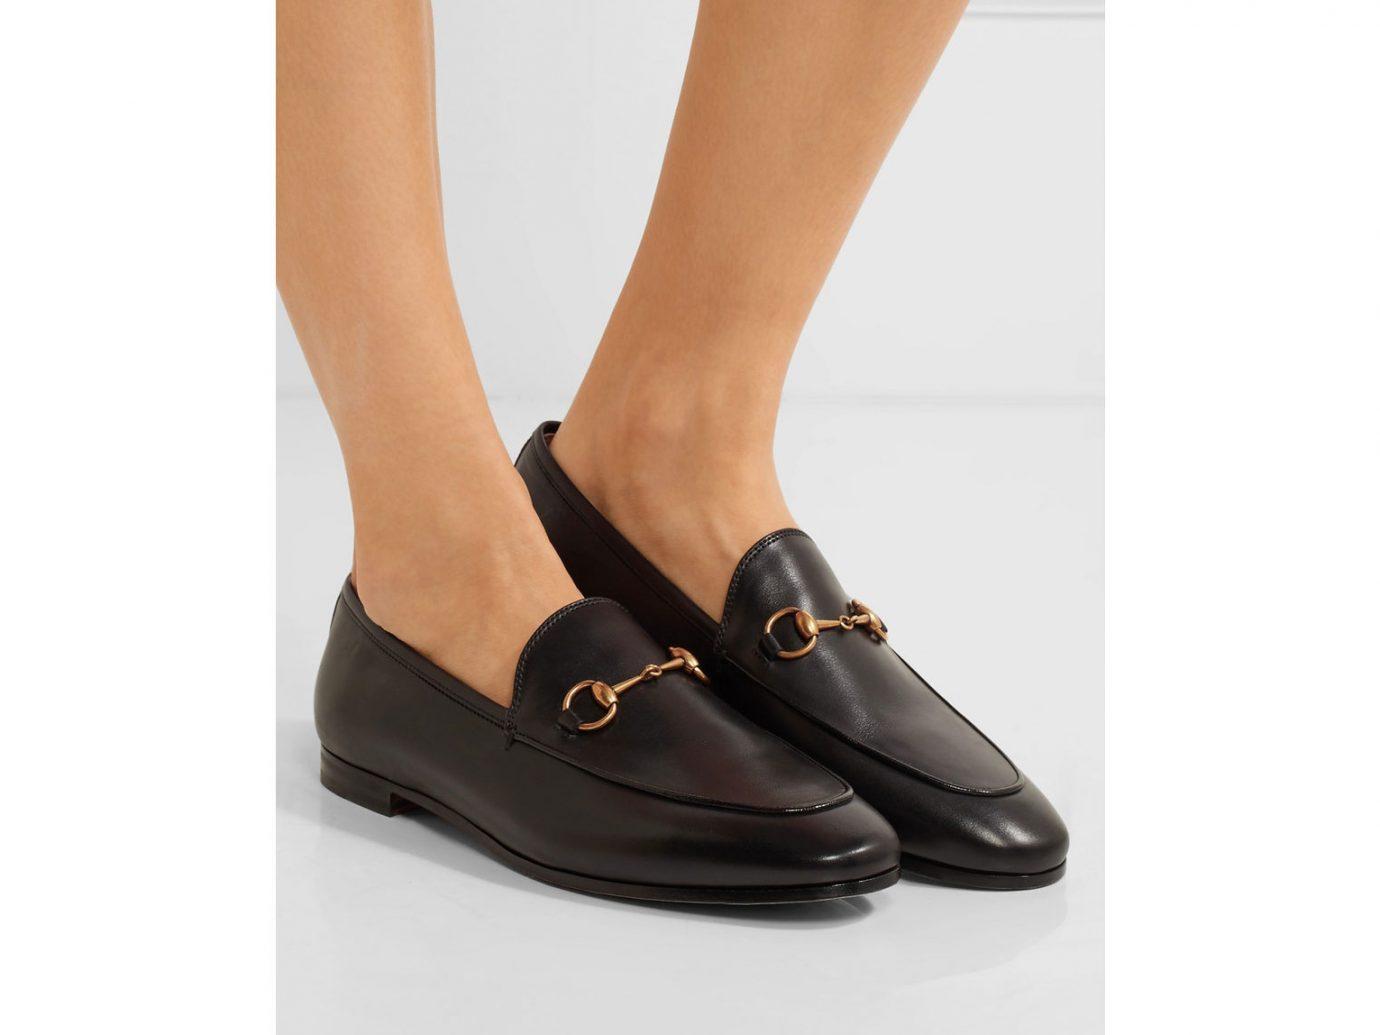 Gucci Jordaan horsebit-detailed leather loafer